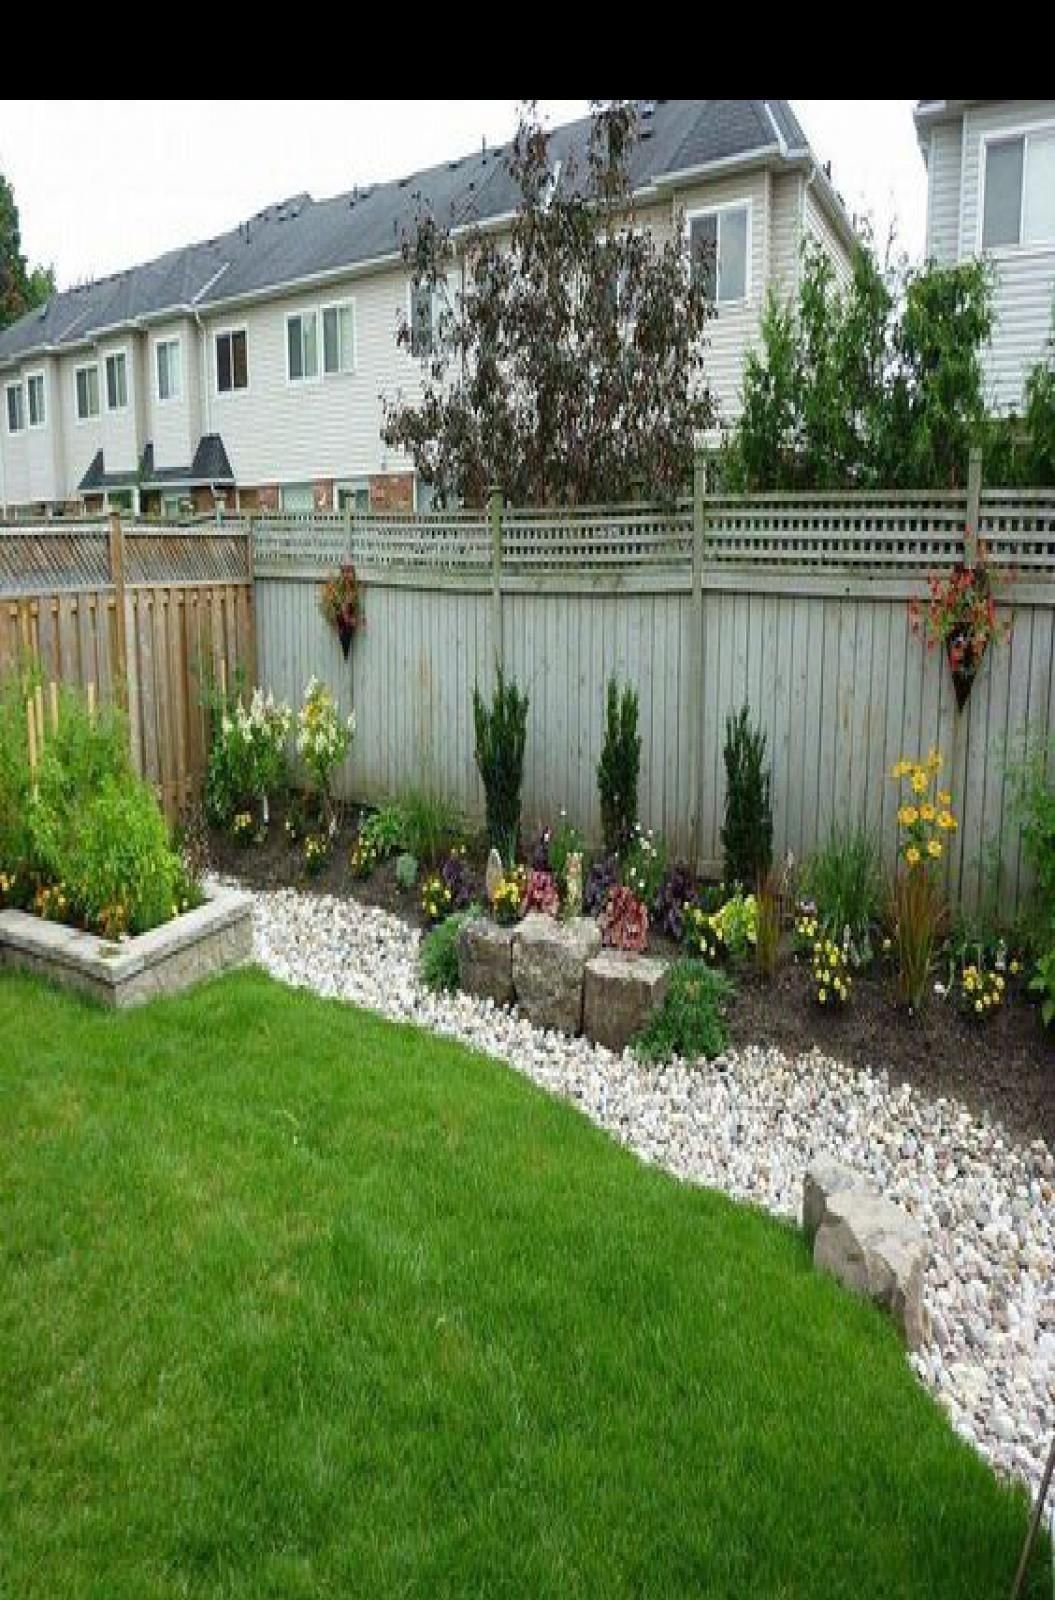 3 Friendly Clever Tips Garden Landscaping Backyard Garden Ideas For Small Space Backyard Clever Fr In 2020 Backyard Landscaping Low Maintenance Backyard Backyard Backyard landscaping ideas along fence